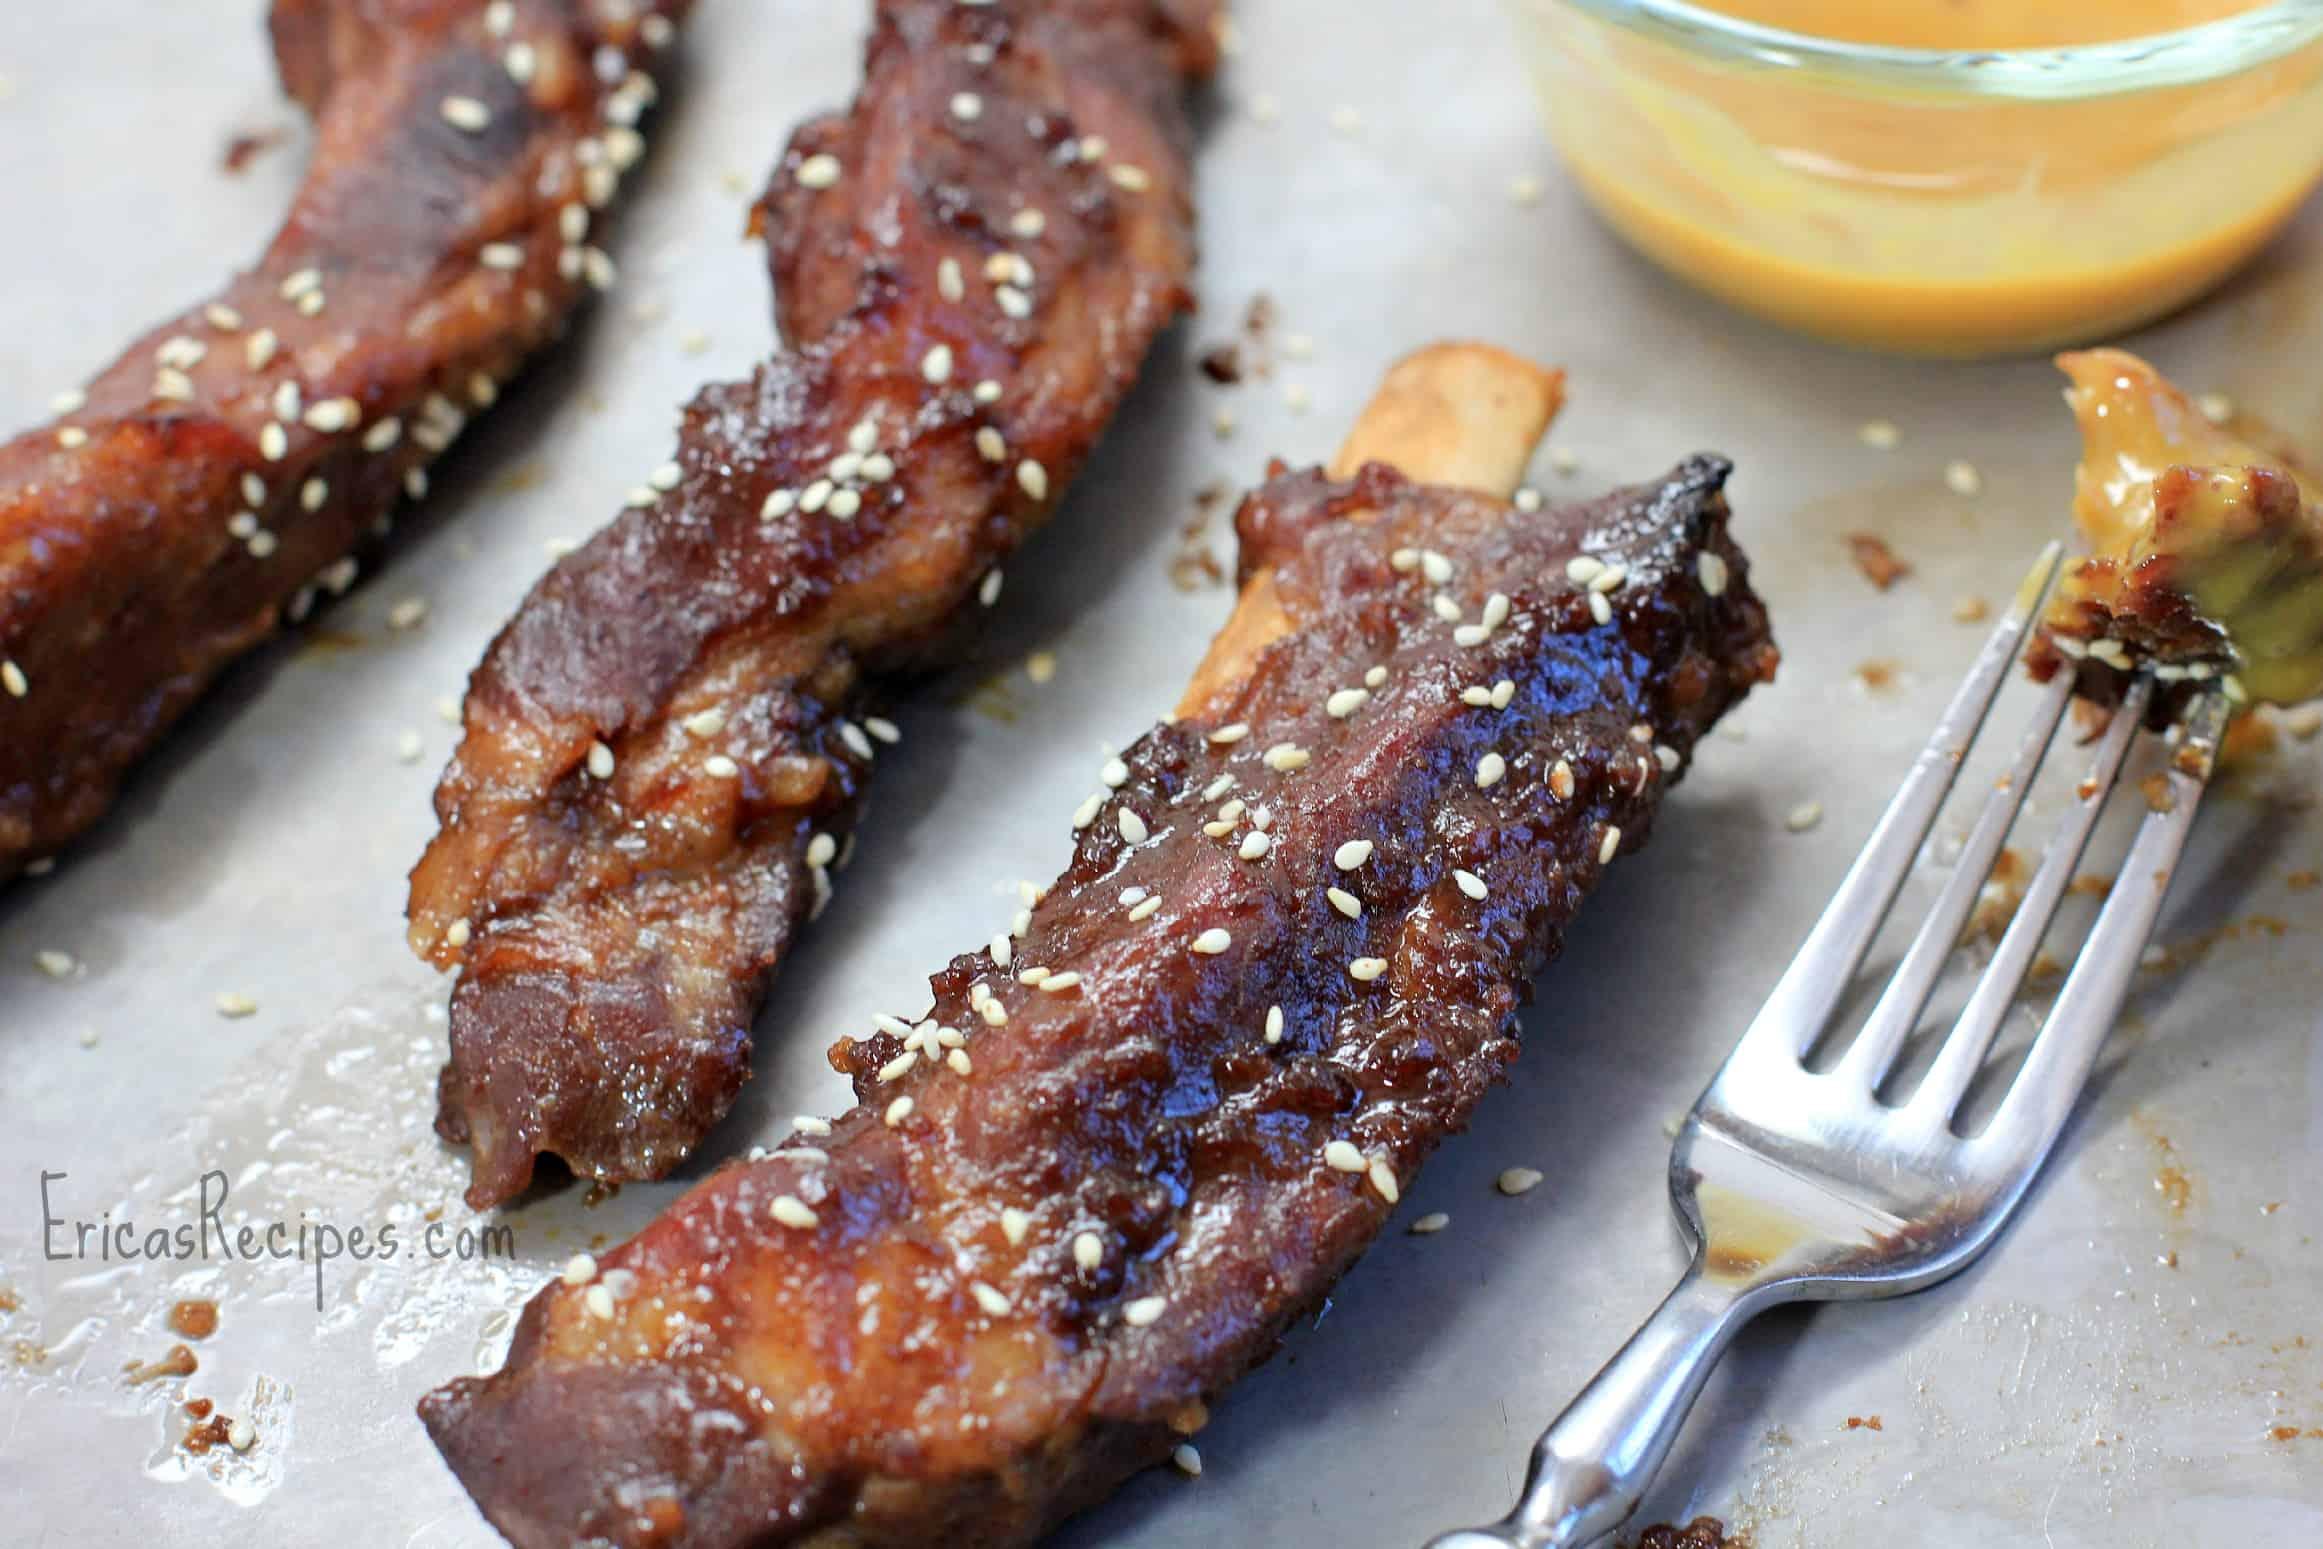 Chinese BBQ Pork Spareribs